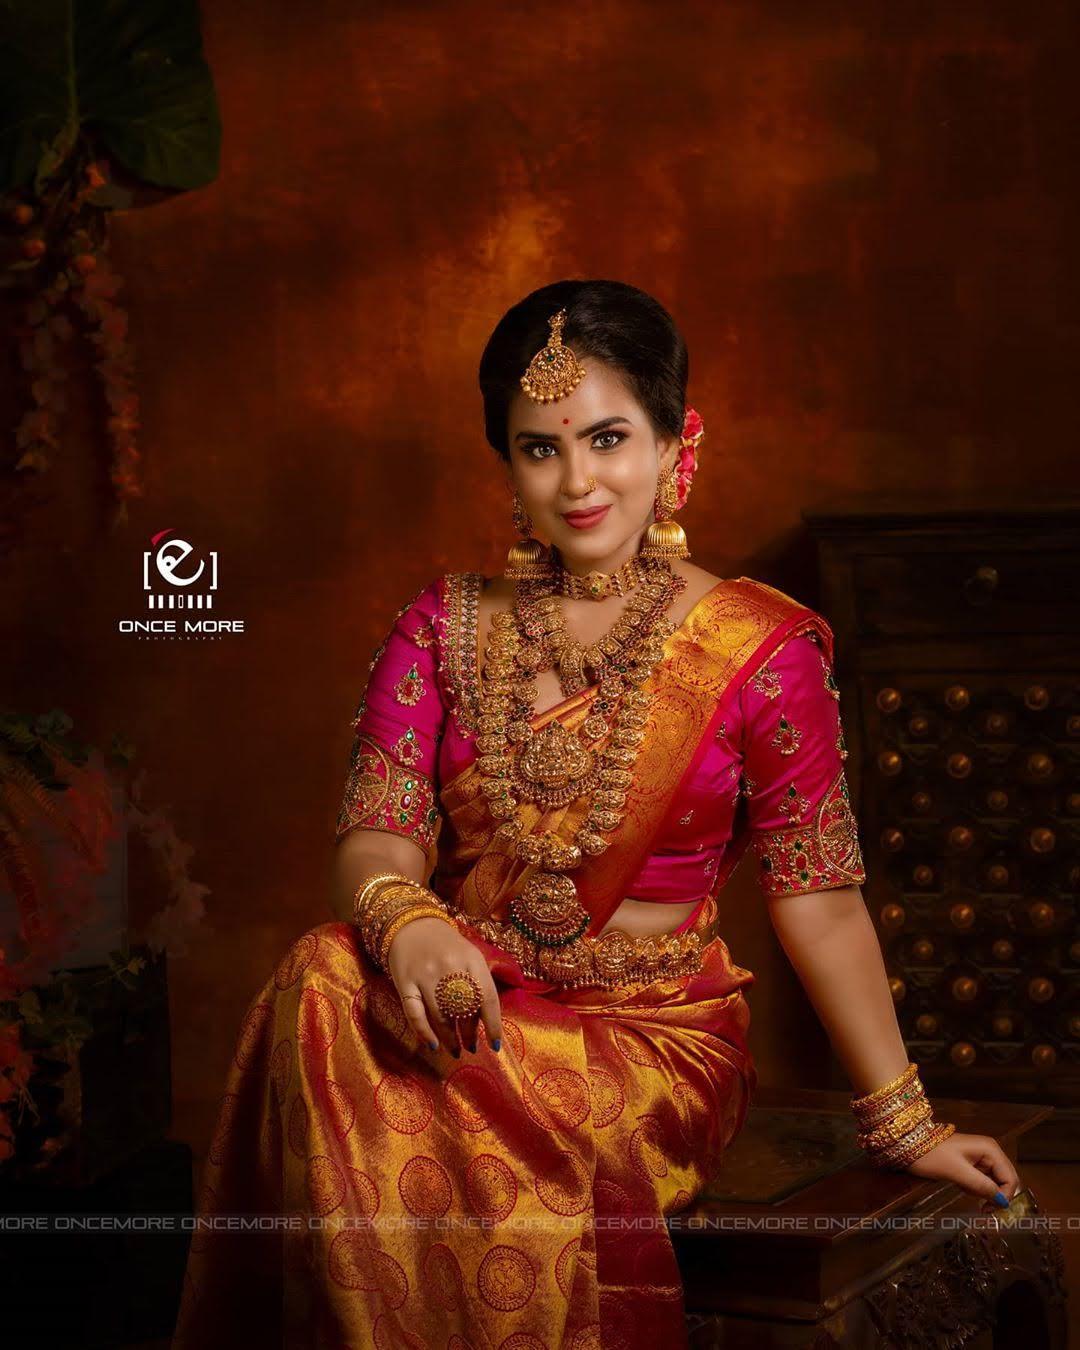 Kanmani-Sweety-Manoharan-Bharathi-Kannamma-15